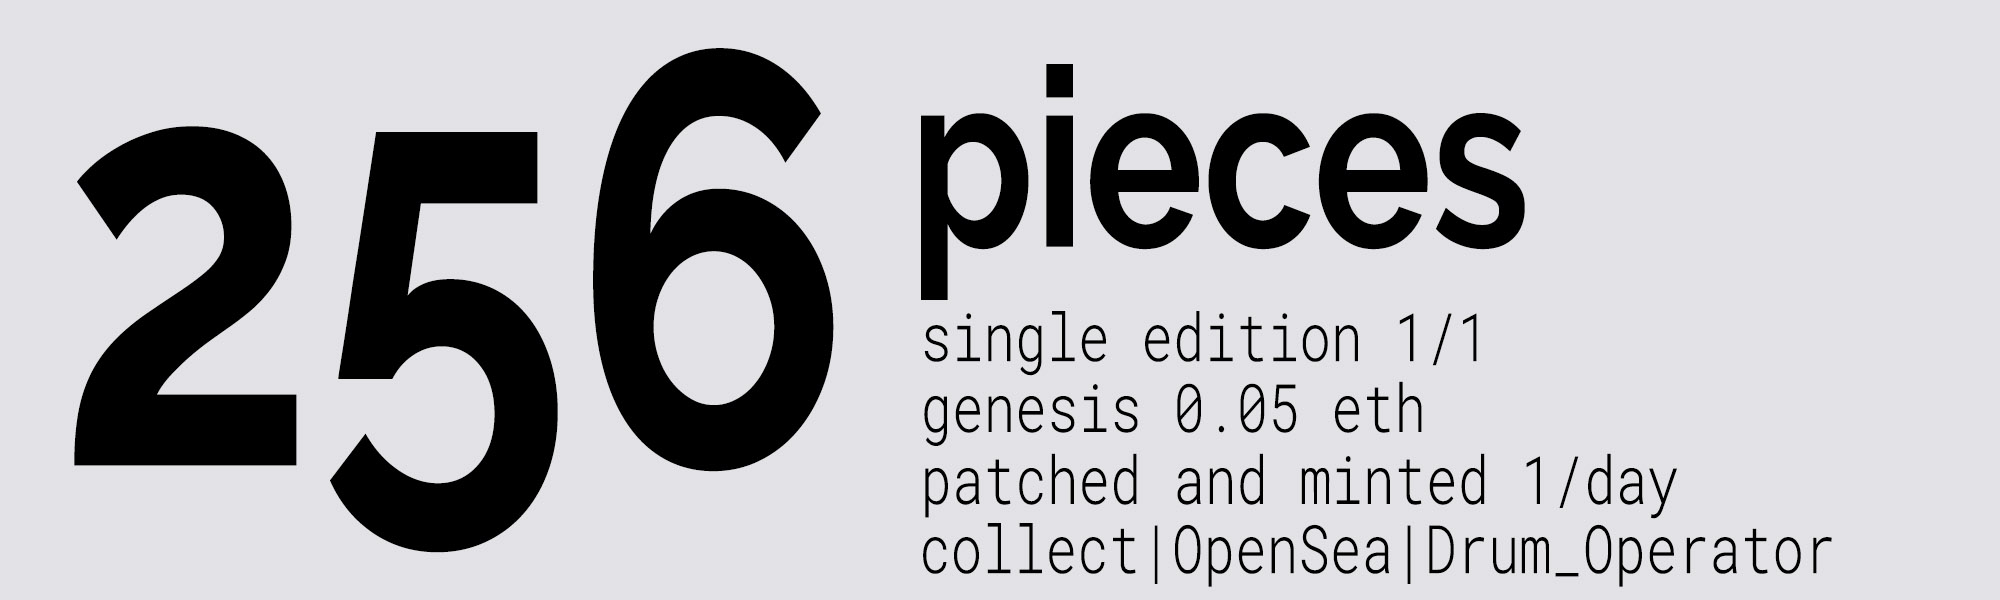 256 pieces 2 .jpg